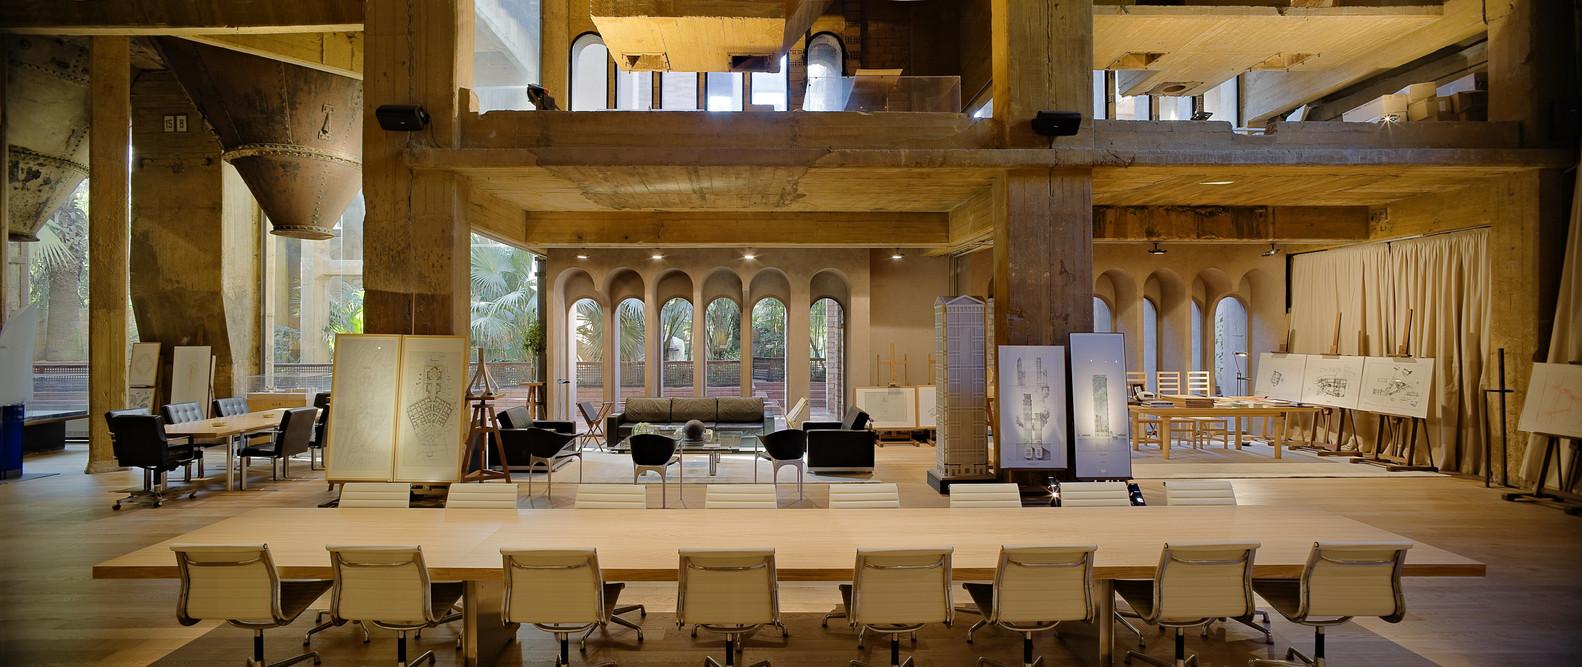 ricardo_bofill_taller_arquitectura_santjustdesvern_barcelona_spain_workspace_4.jpg